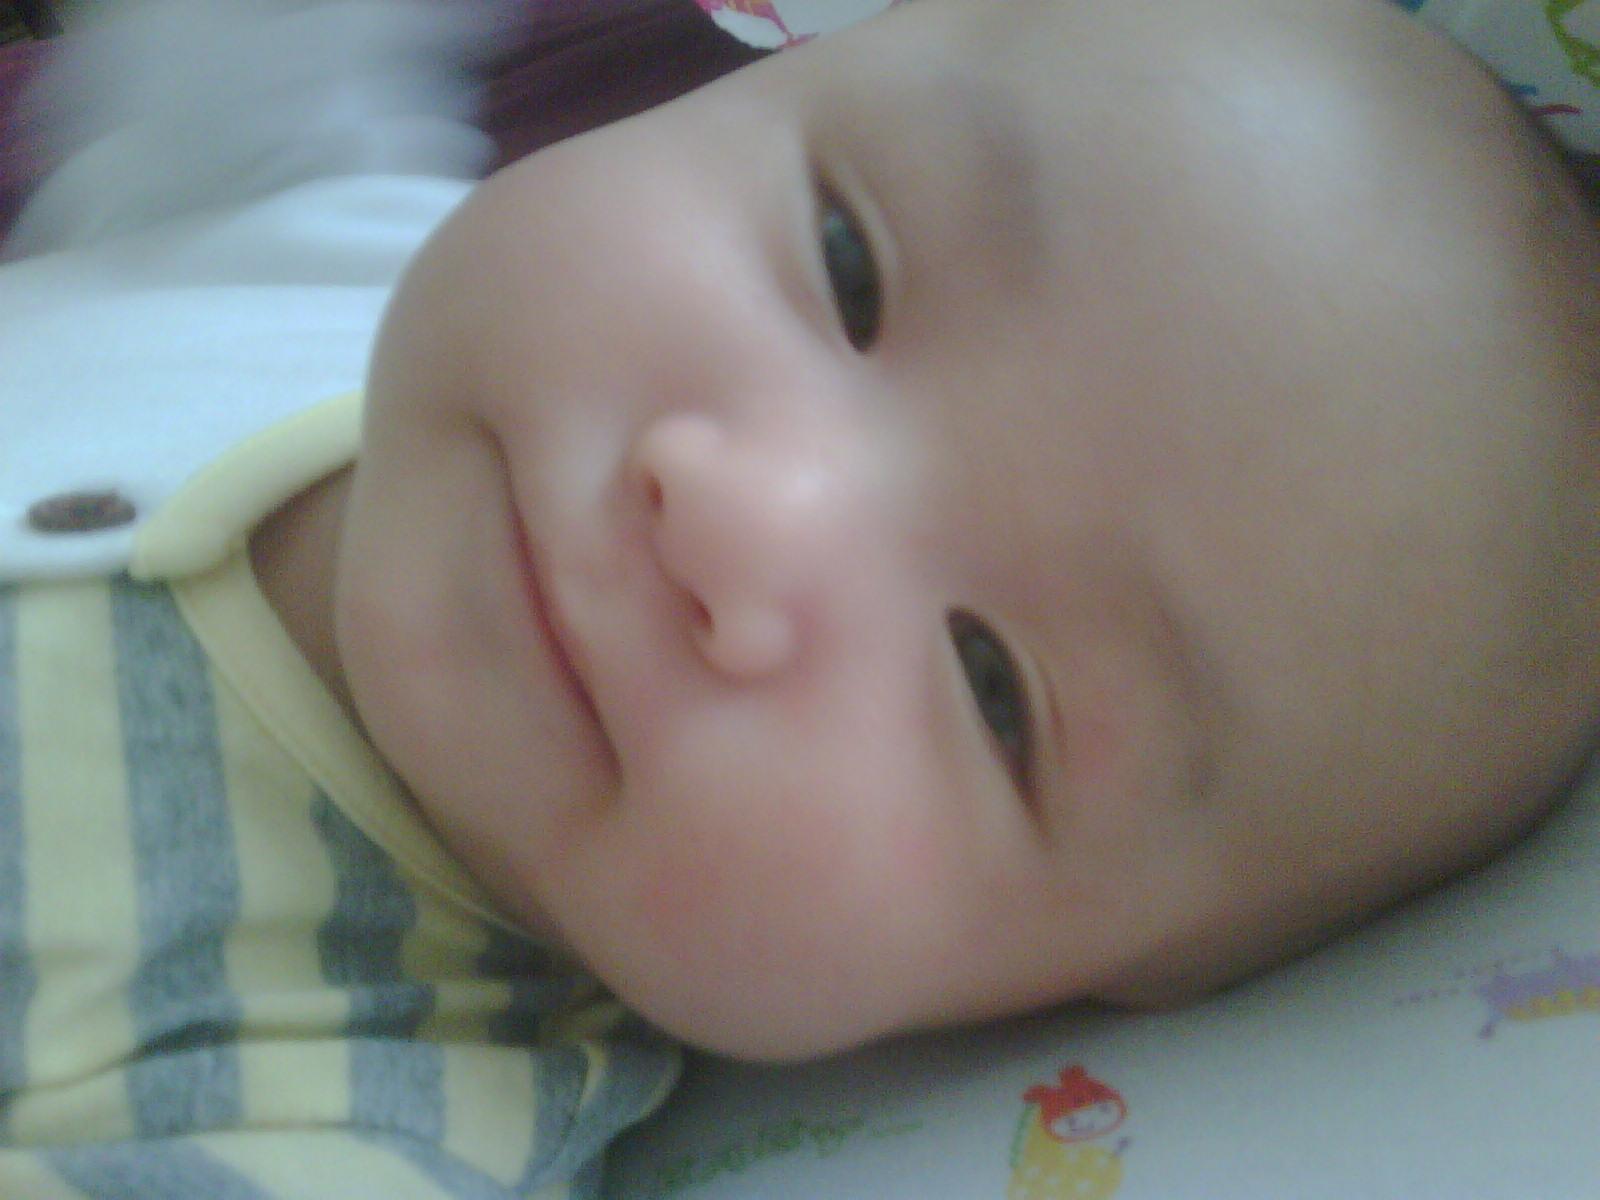 Sipit Dan Putih Seperti Bayi Cinak Kesukaan Guee Padahal Ya Yang Kepengen Bayi Cina Tuh Guee Kakak Gue Malah Pas Hamil Tu Ngidam Pengen Bayi Arab